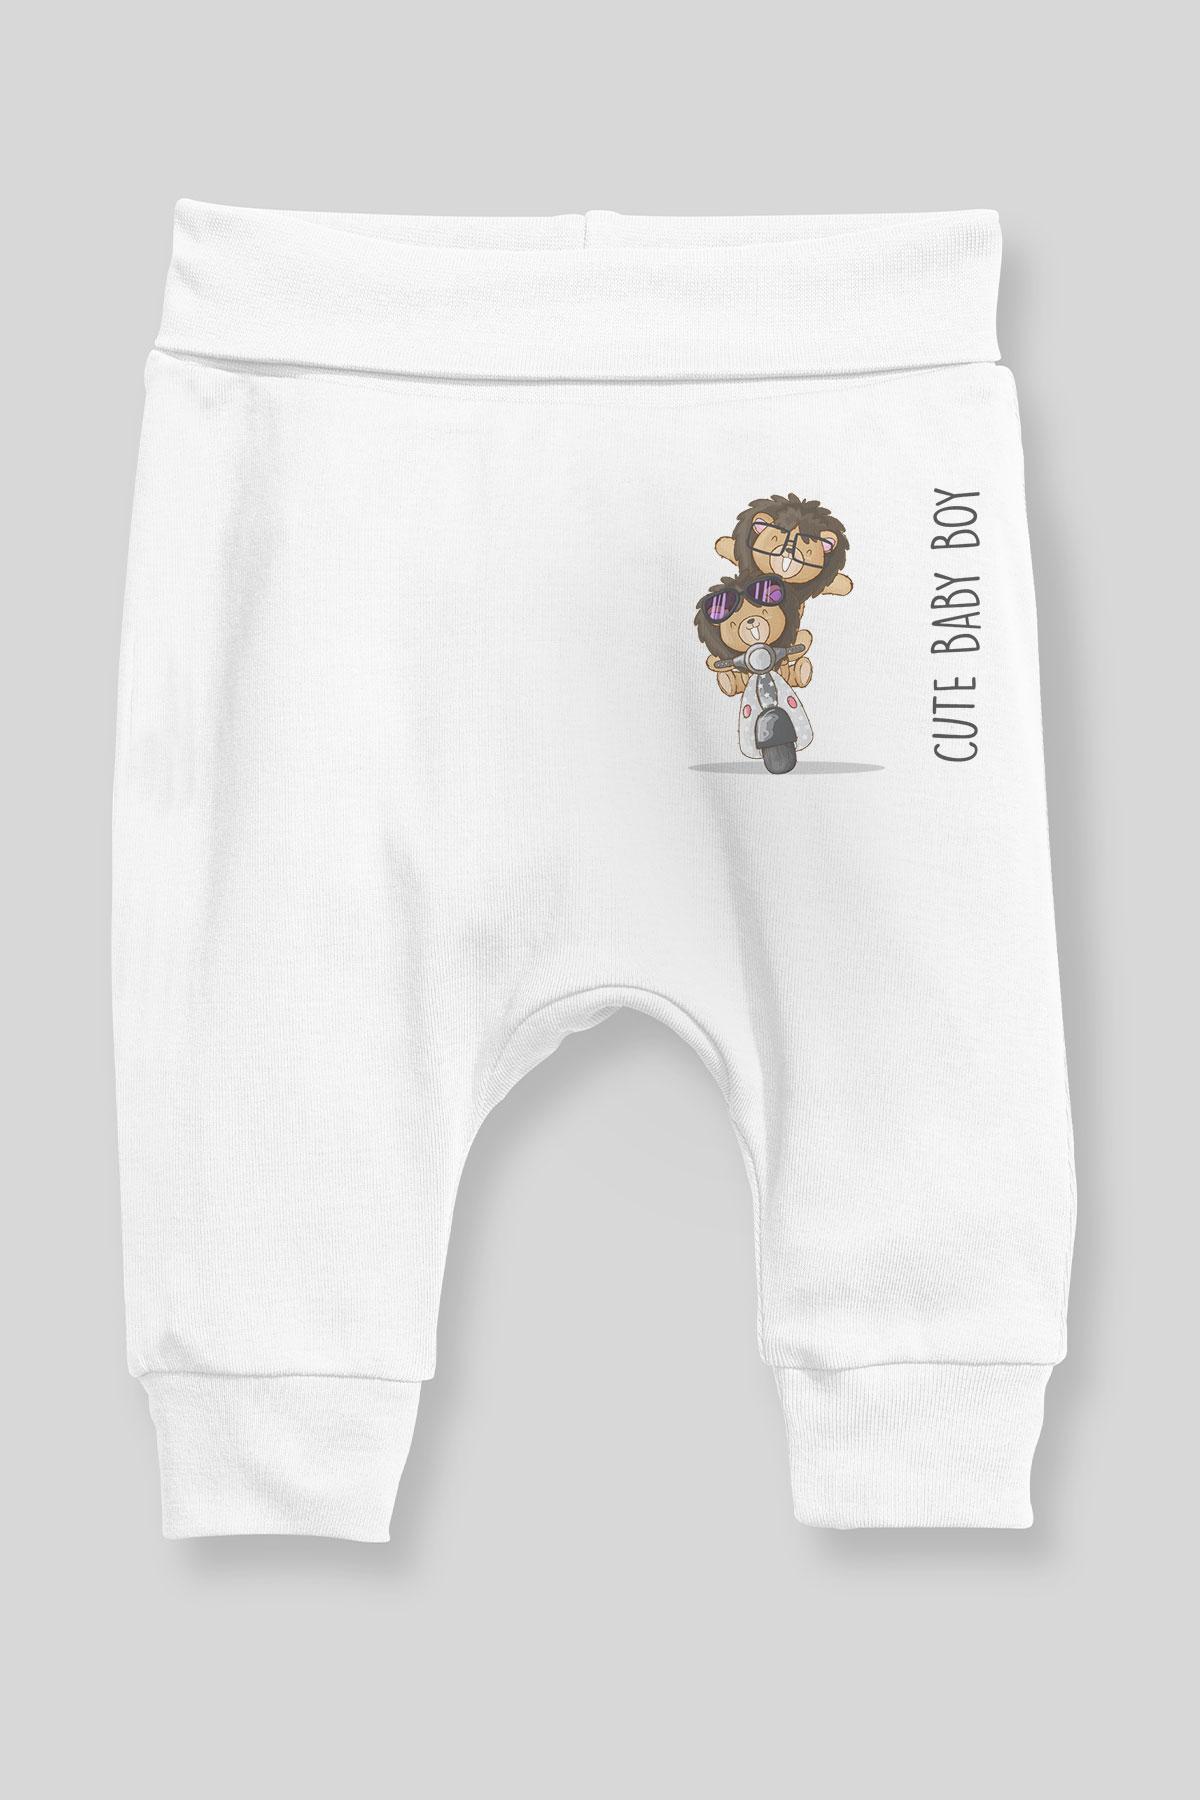 Angemiel Bebe Motor Suren Lindo Leones Bebe Pantalones De Chica De Harem Pantalon Blanco Pantalones Aliexpress